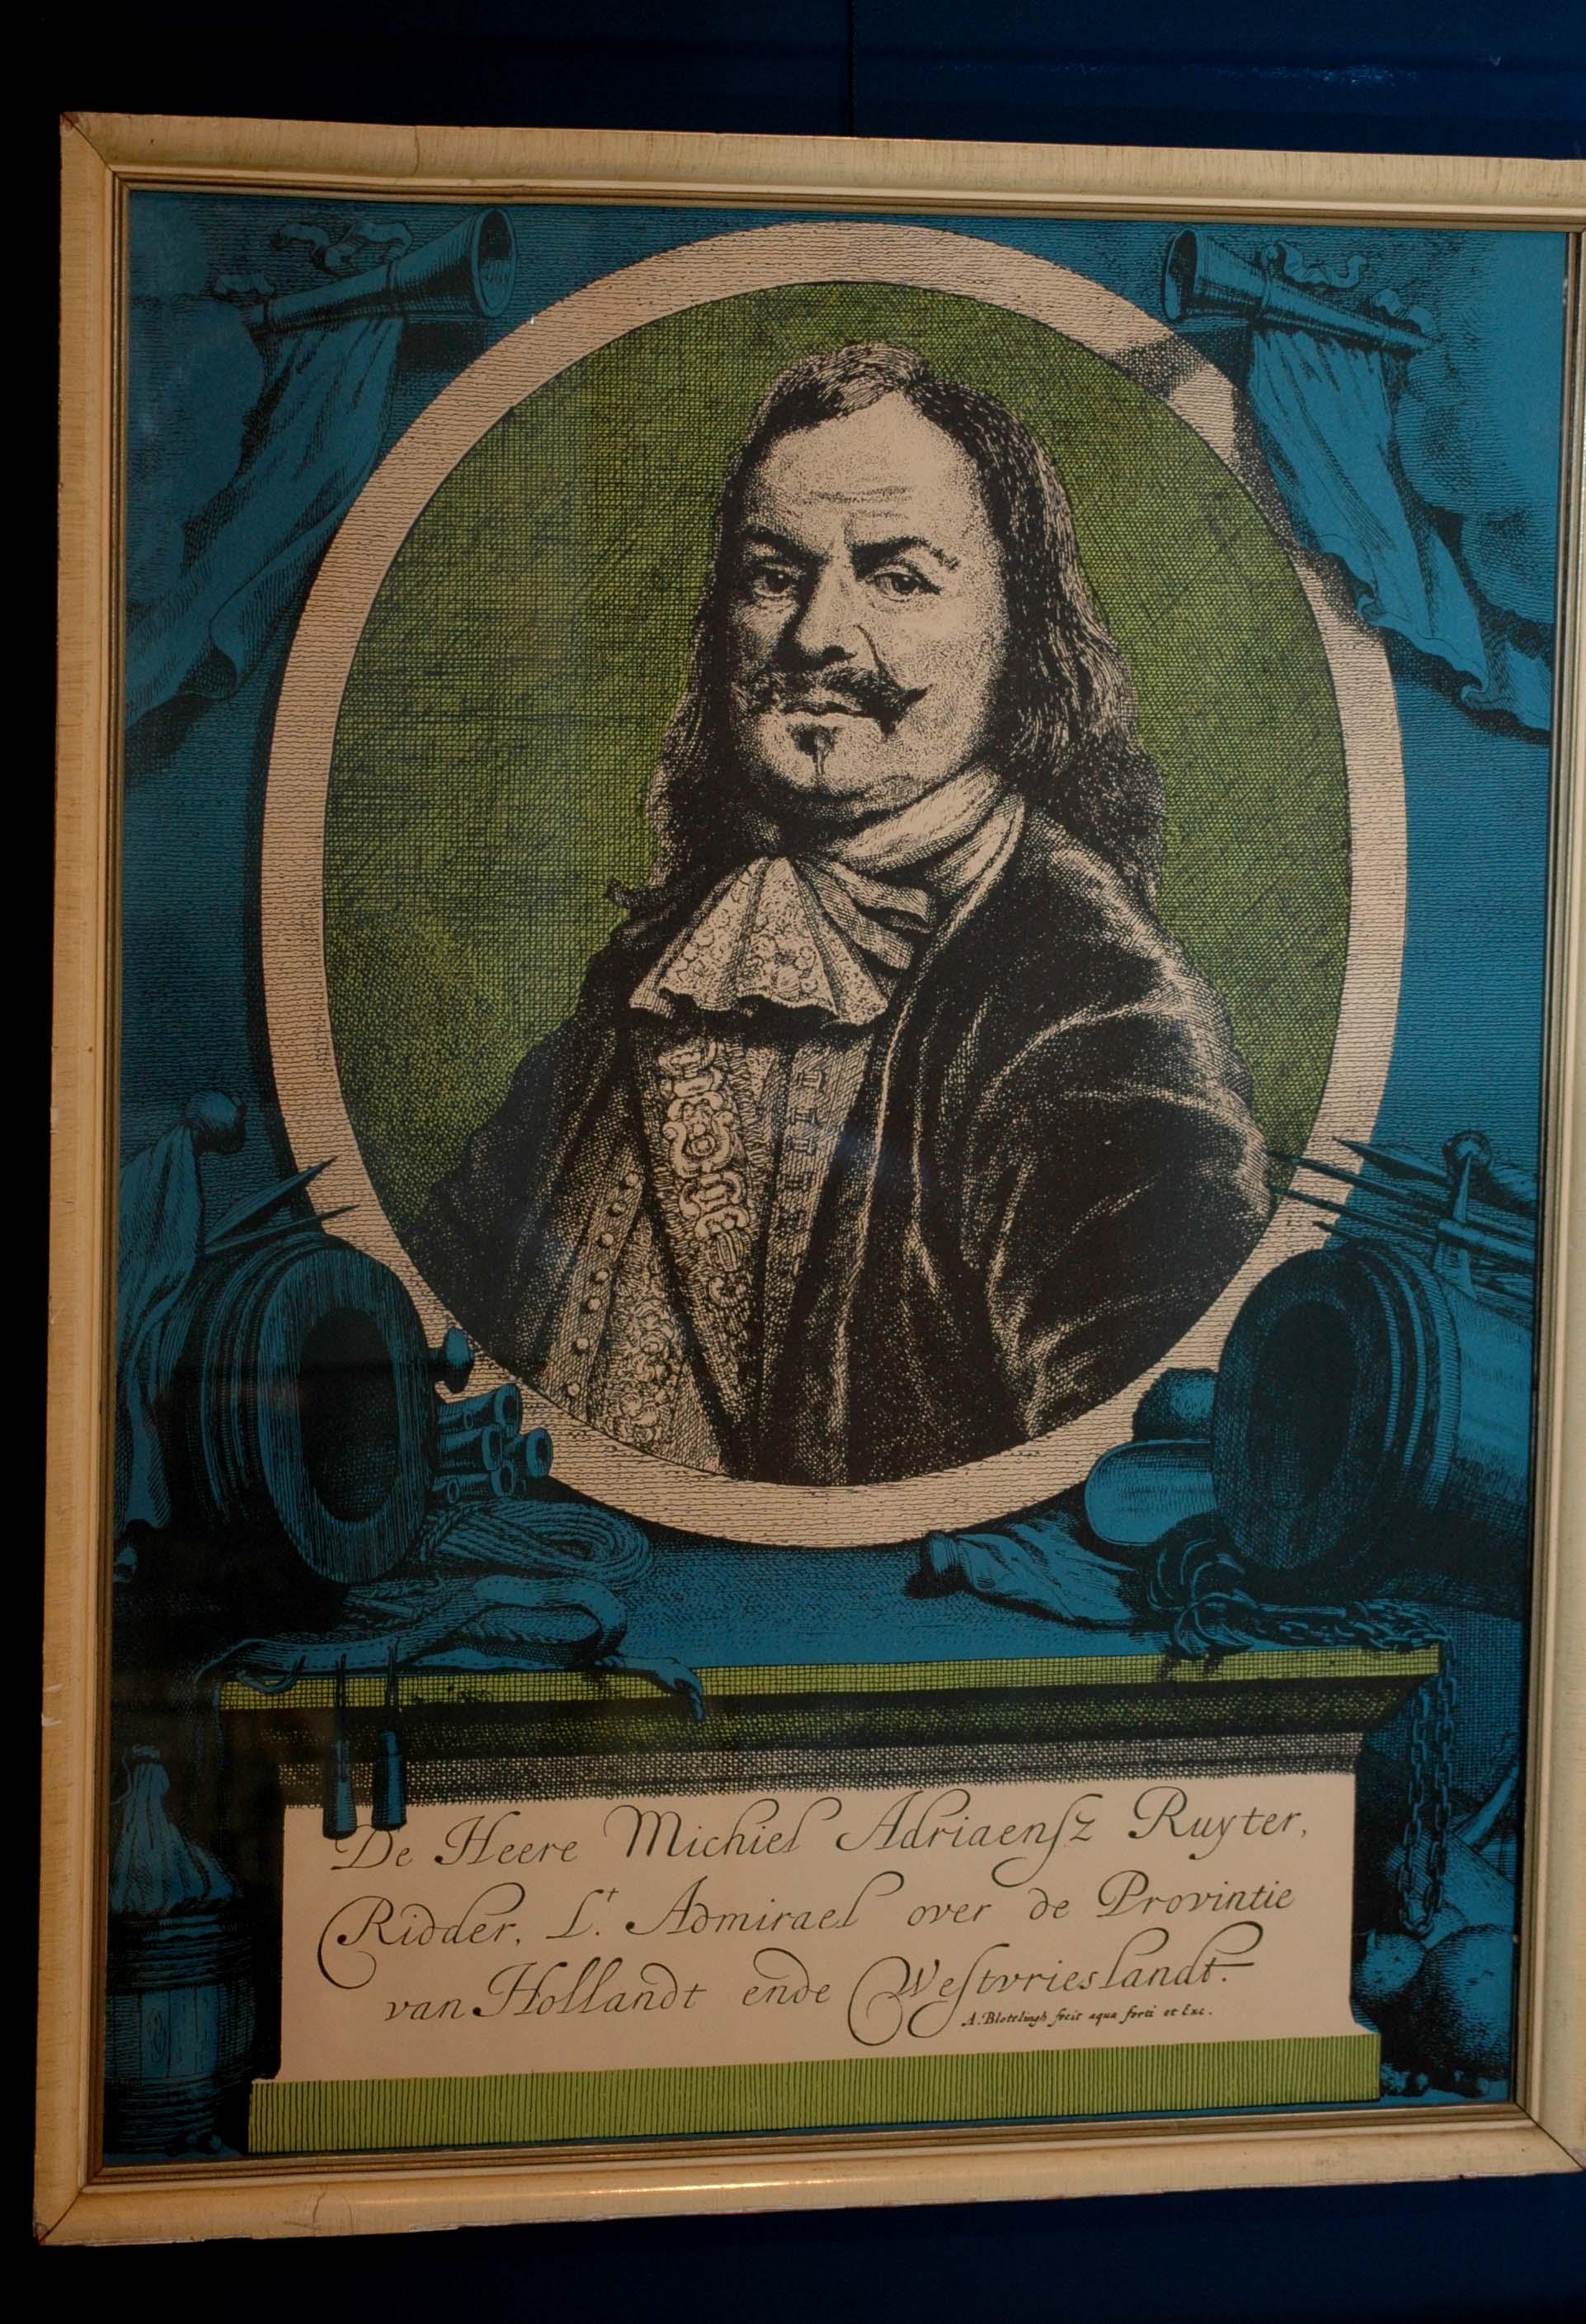 Michiel Adriaanzoon de Ruyter